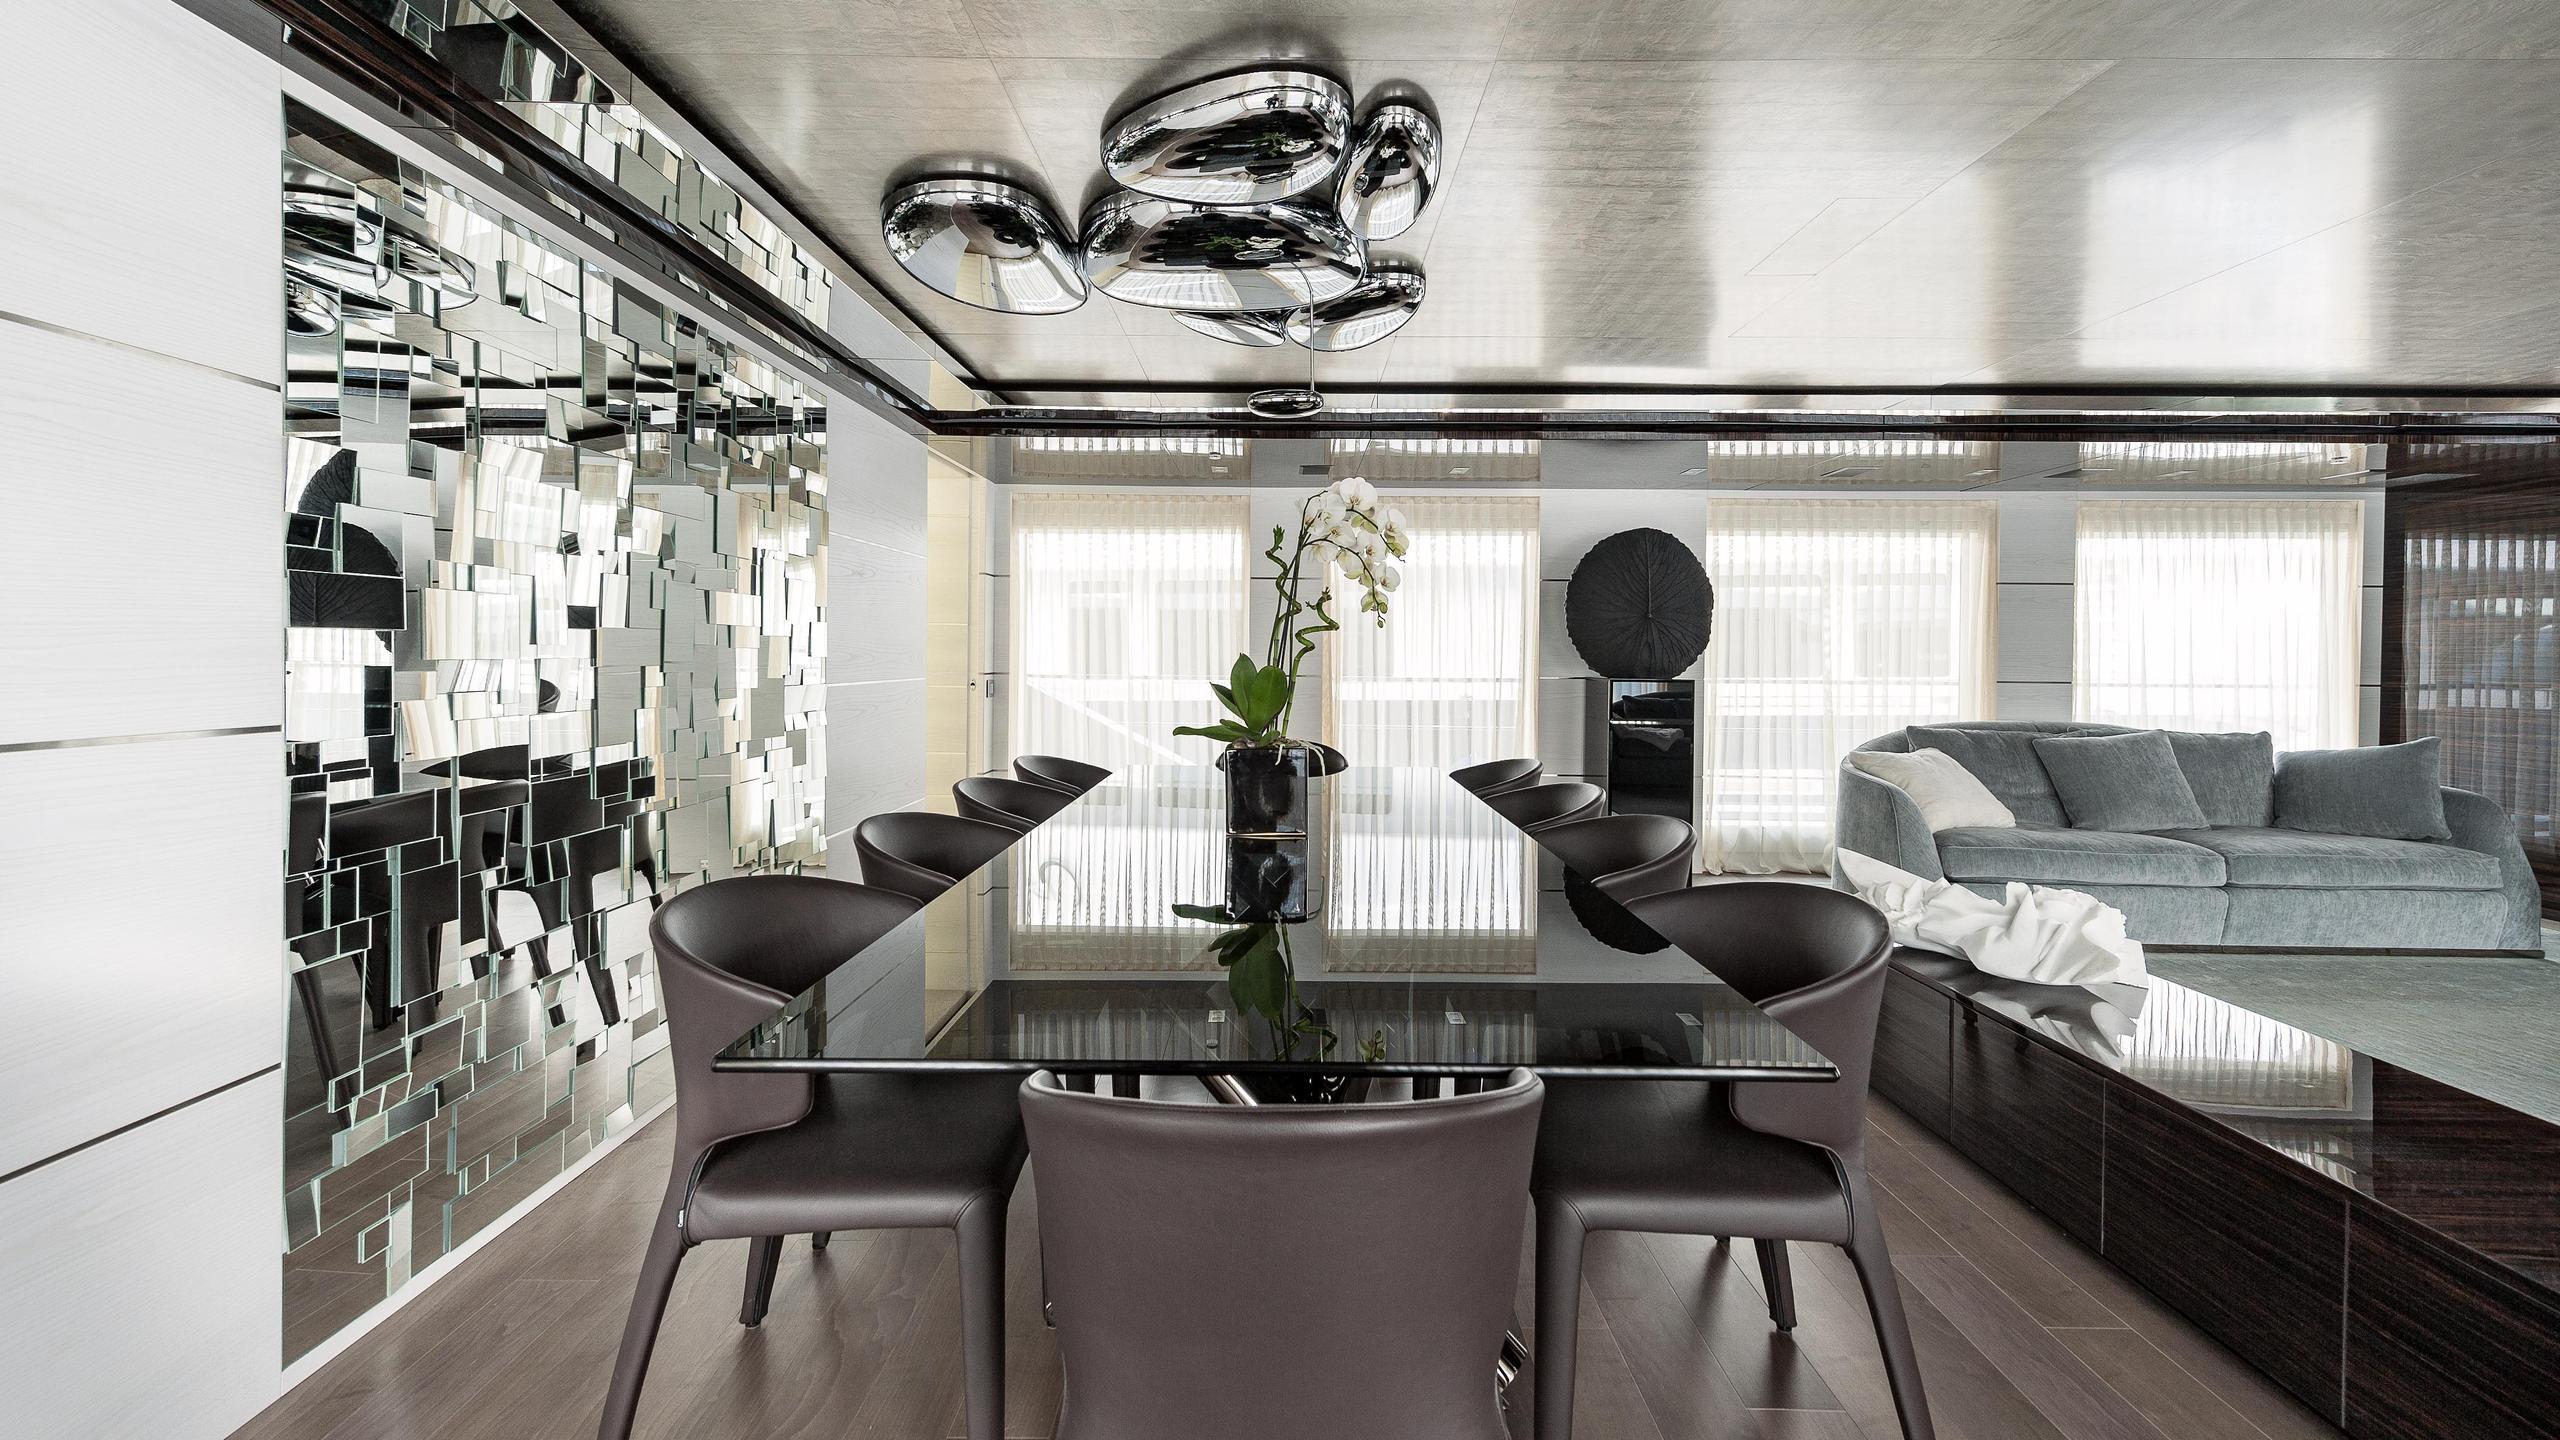 entourage-motor-yacht-admiral-the-italian-sea-group-2014-47m-dining-room